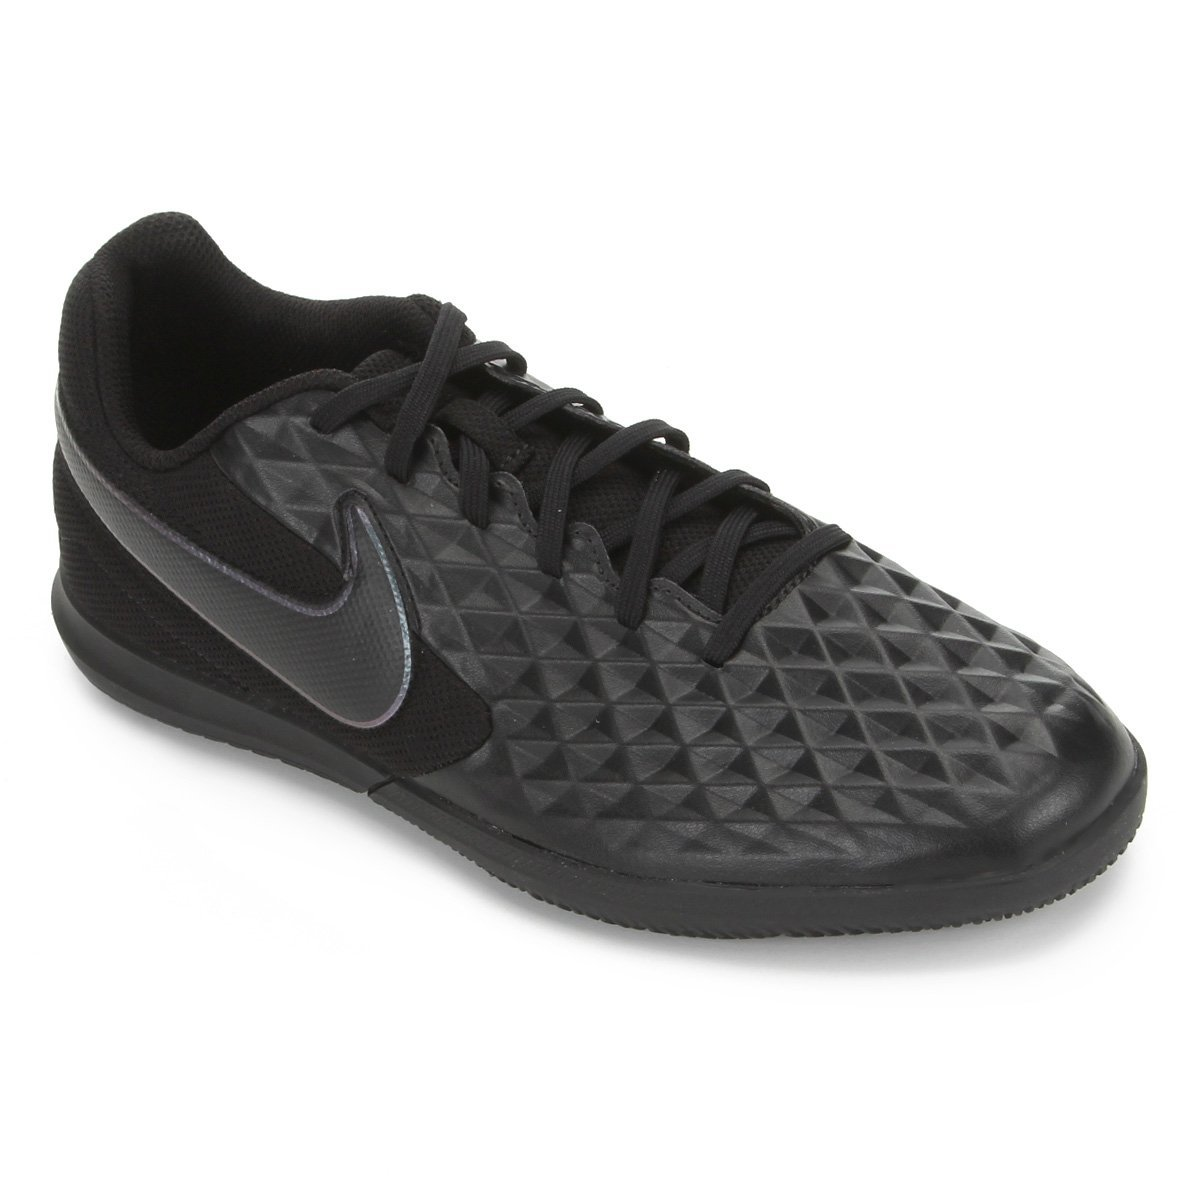 Chuteira Nike Tiempo Legend 8 Academy